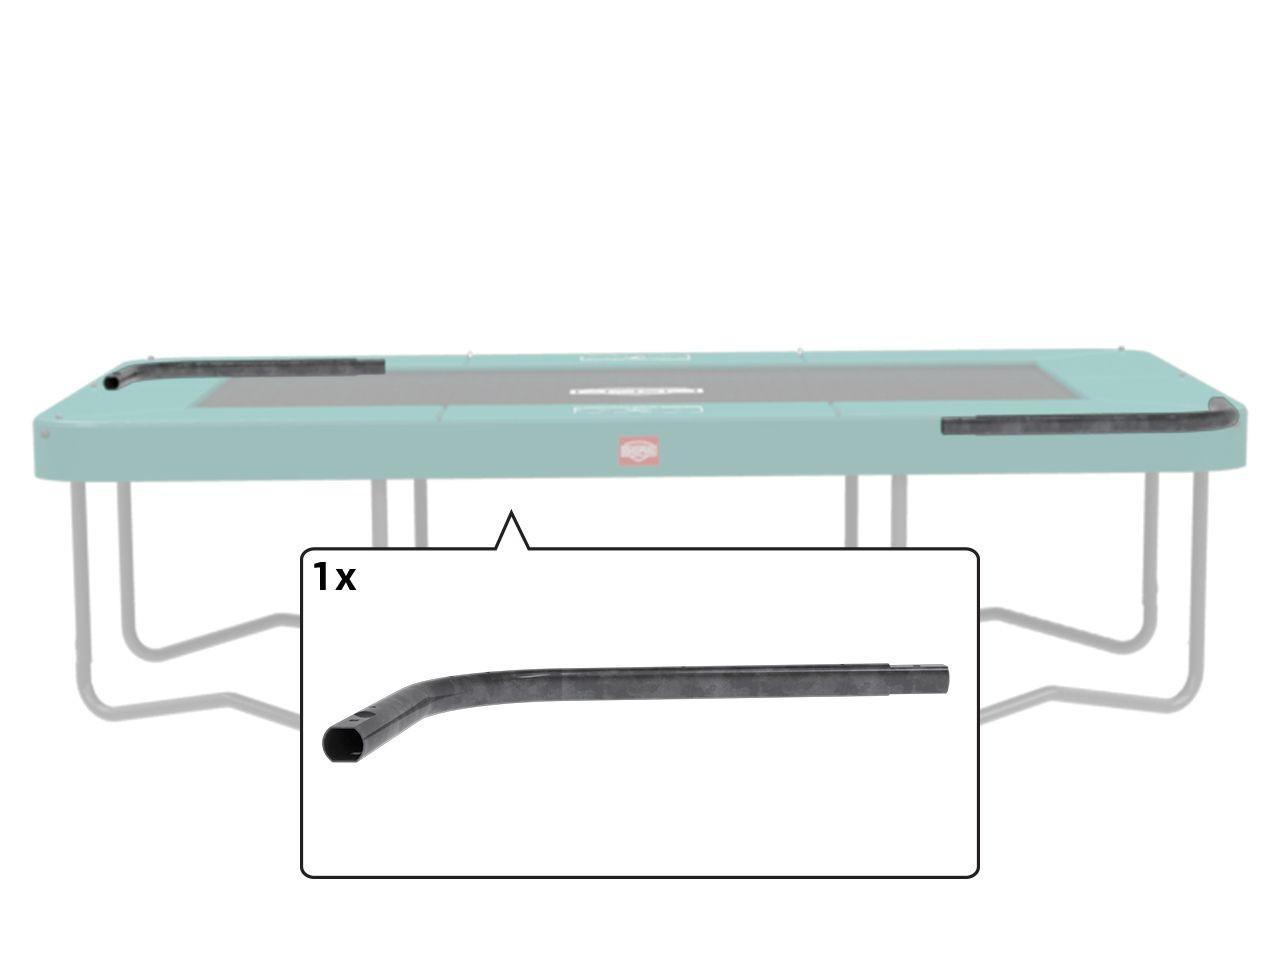 EazyFit - Toprail corner left (TwinSpring)